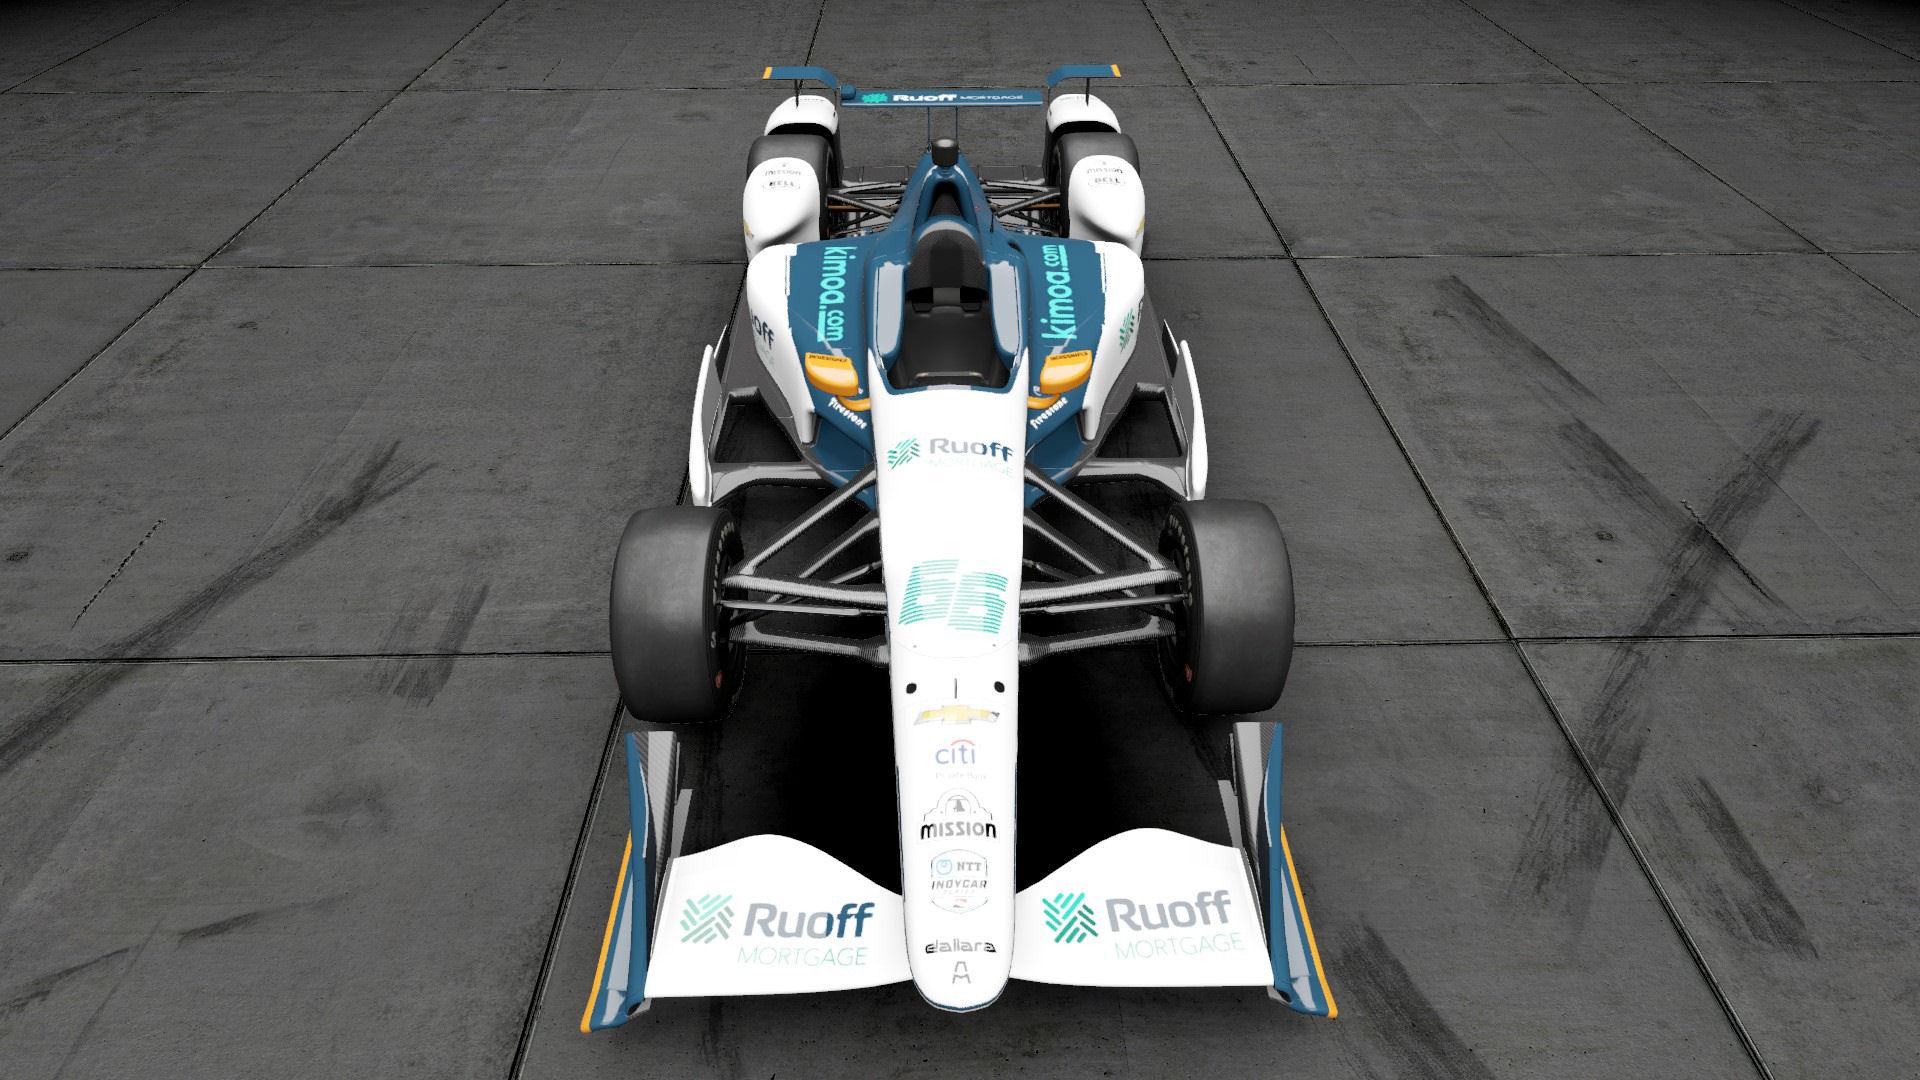 Fernando Alonso 2020 Indy 500 Mclaren dallara dw12 chevy oval 04.jpg